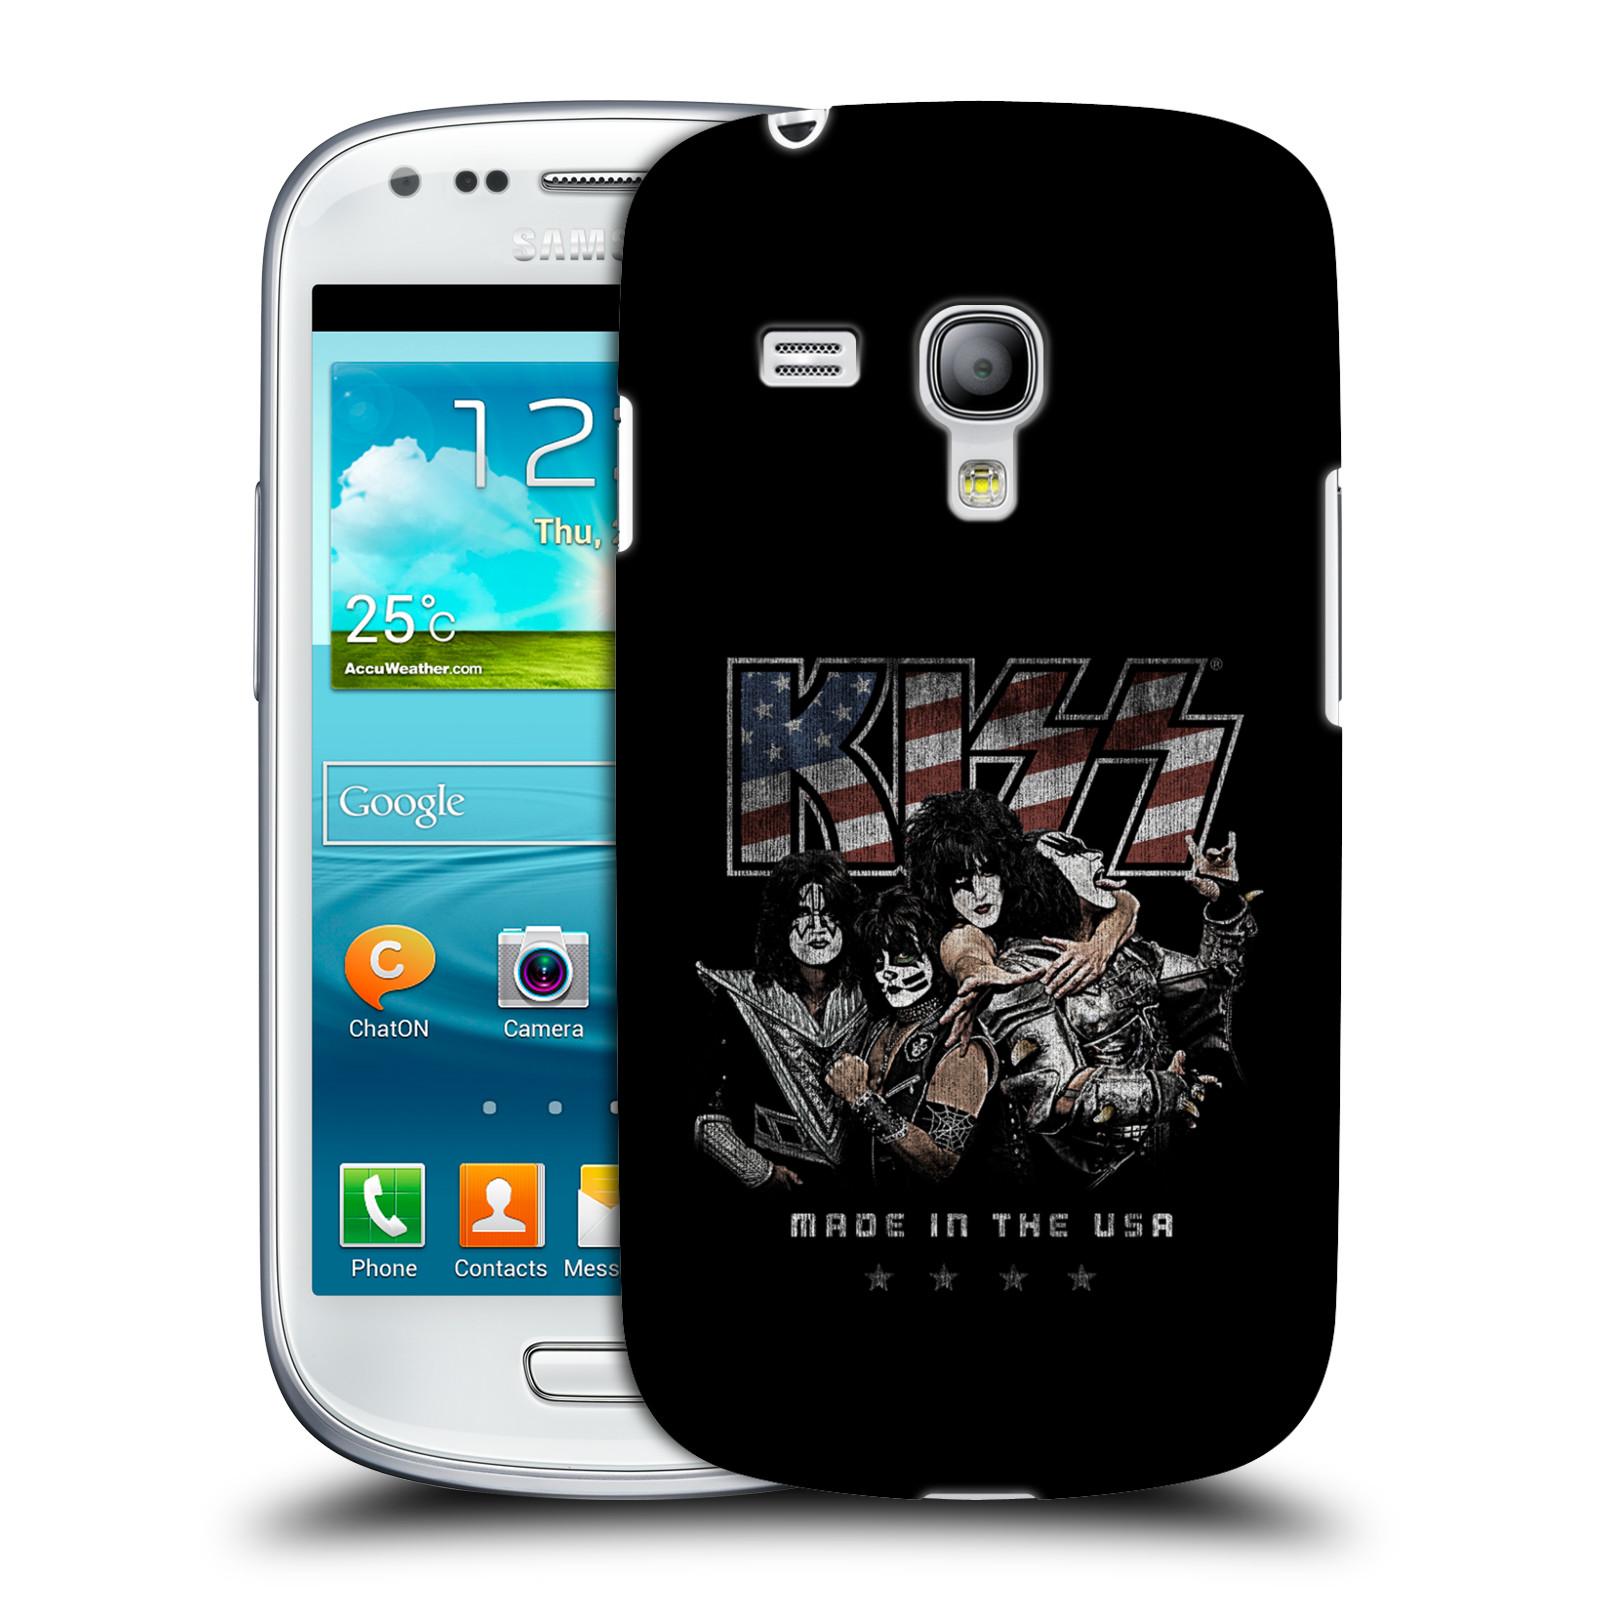 Silikonové pouzdro na mobil Samsung Galaxy S III Mini VE HEAD CASE - Kiss - MADE IN THE USA (Plastový kryt či obal na mobilní telefon s licencovaným motivem Kiss pro Samsung Galaxy S3 Mini VE GT-i8200)